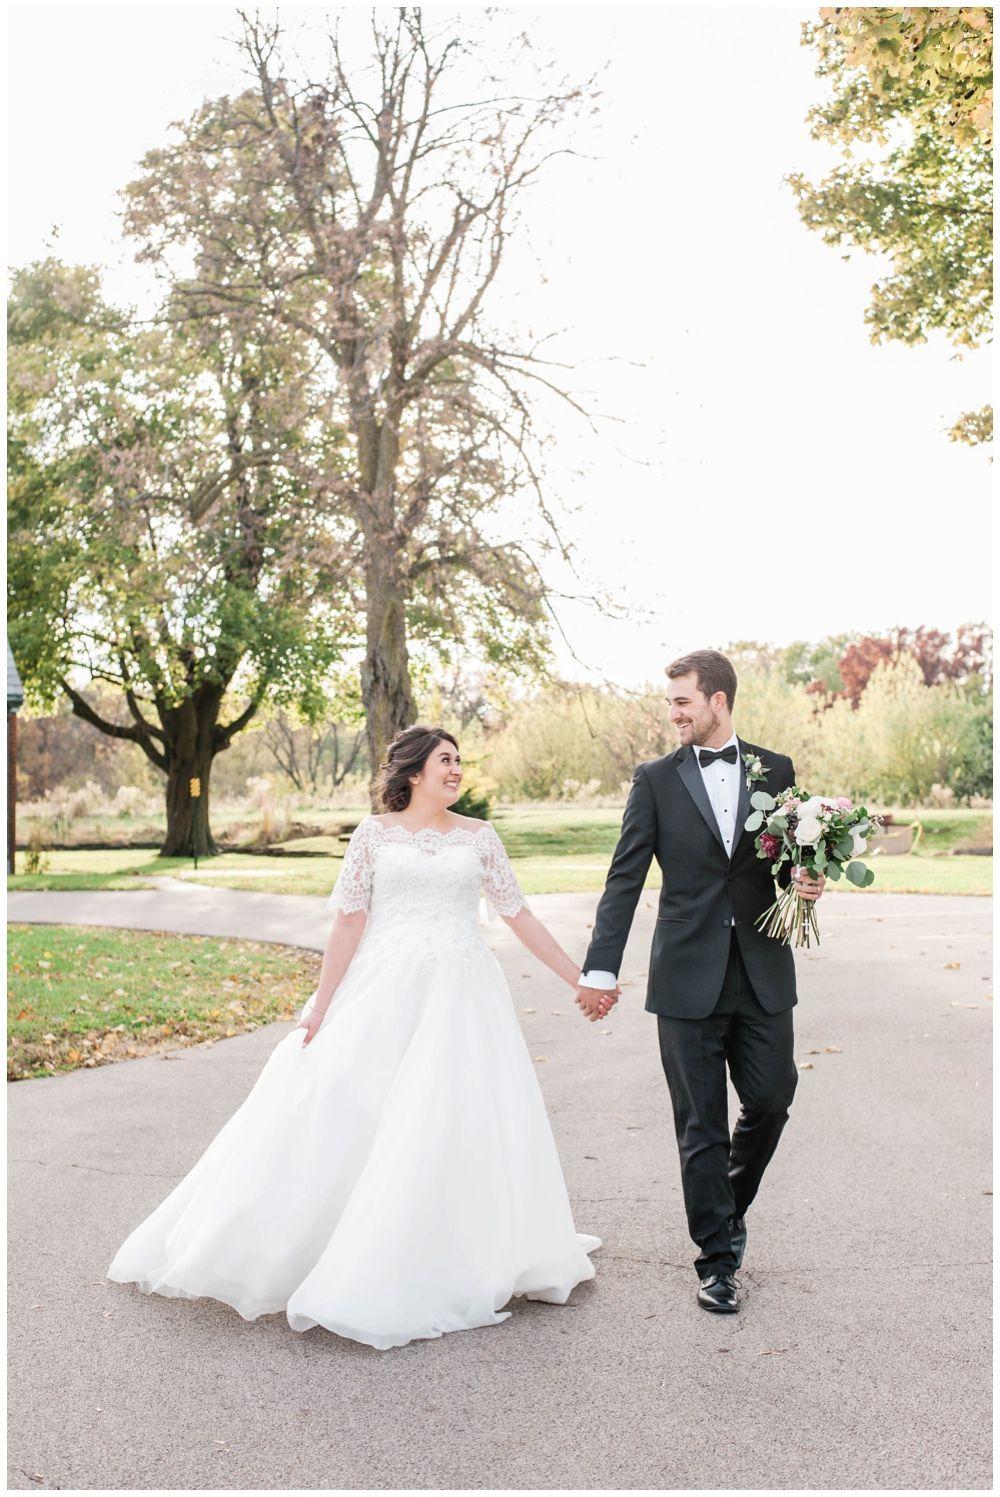 Venutius addison black tie wedding chicago wedding photography